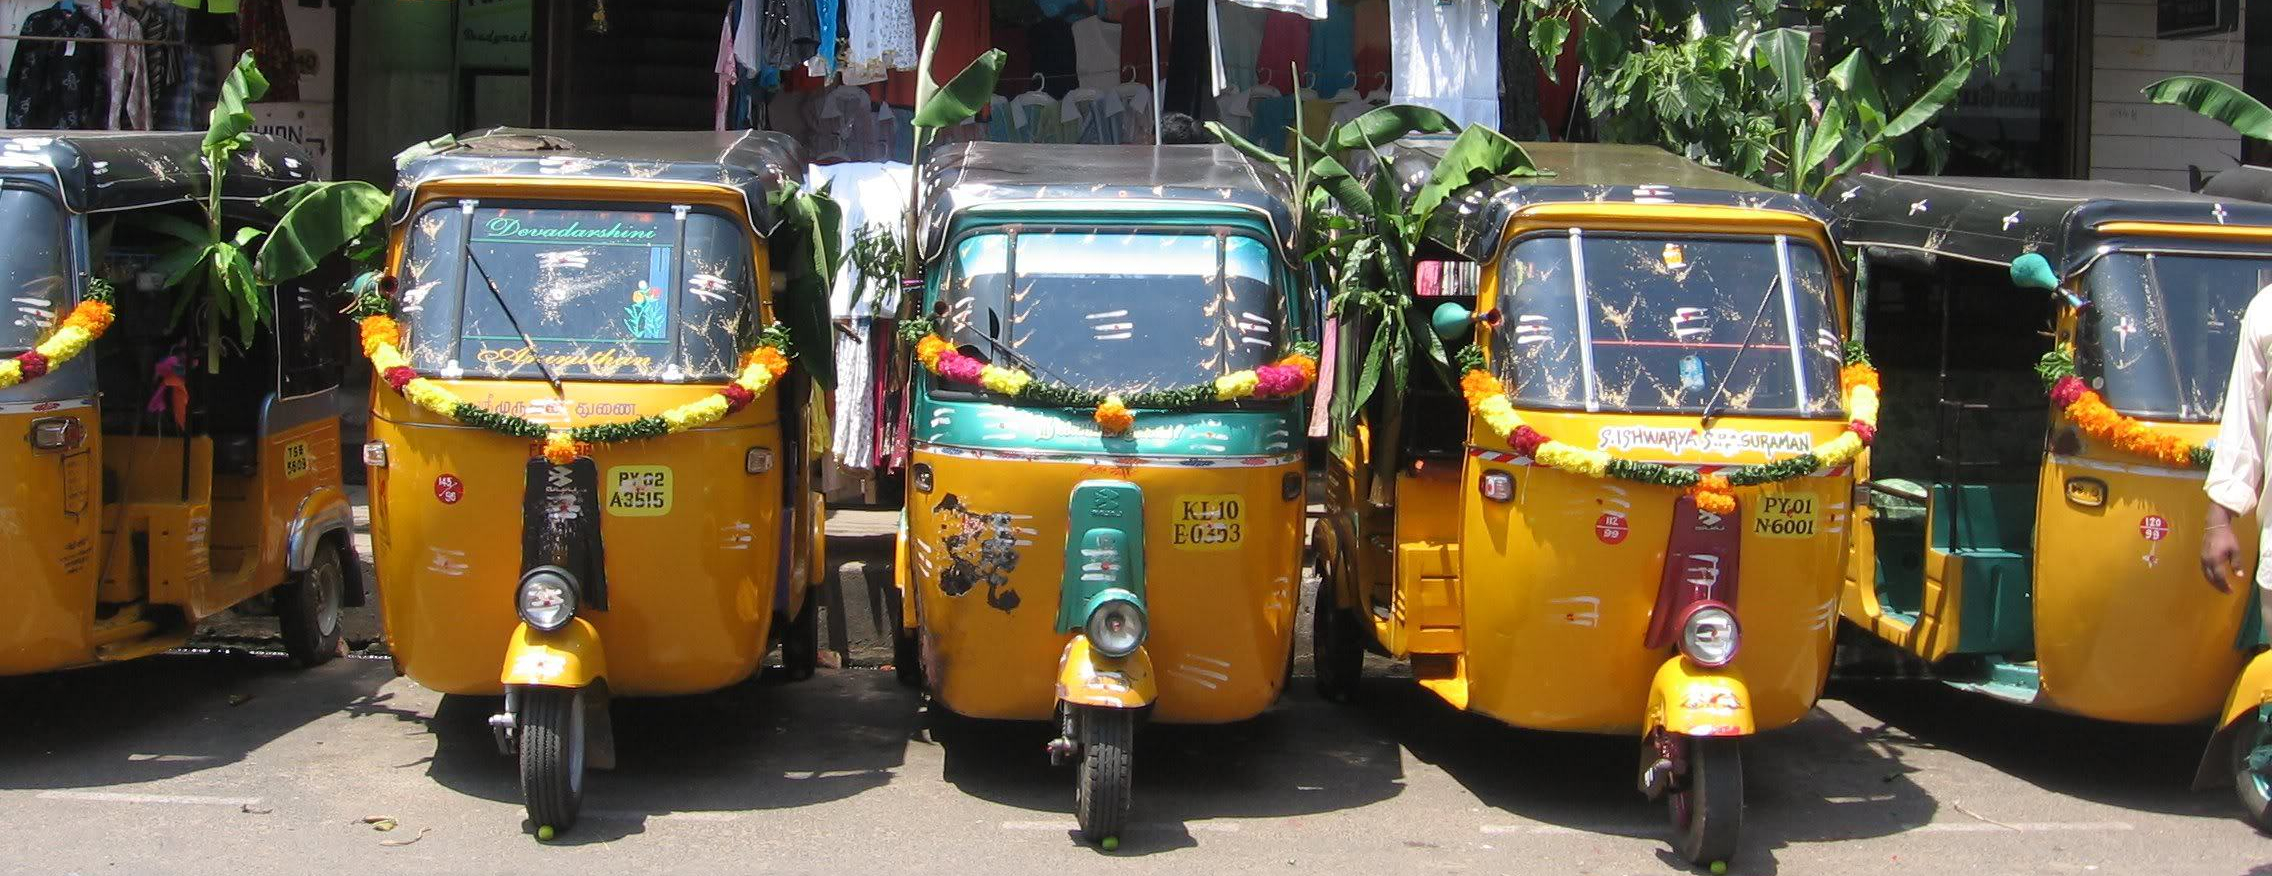 vehicles-ayudha-puja.jpg